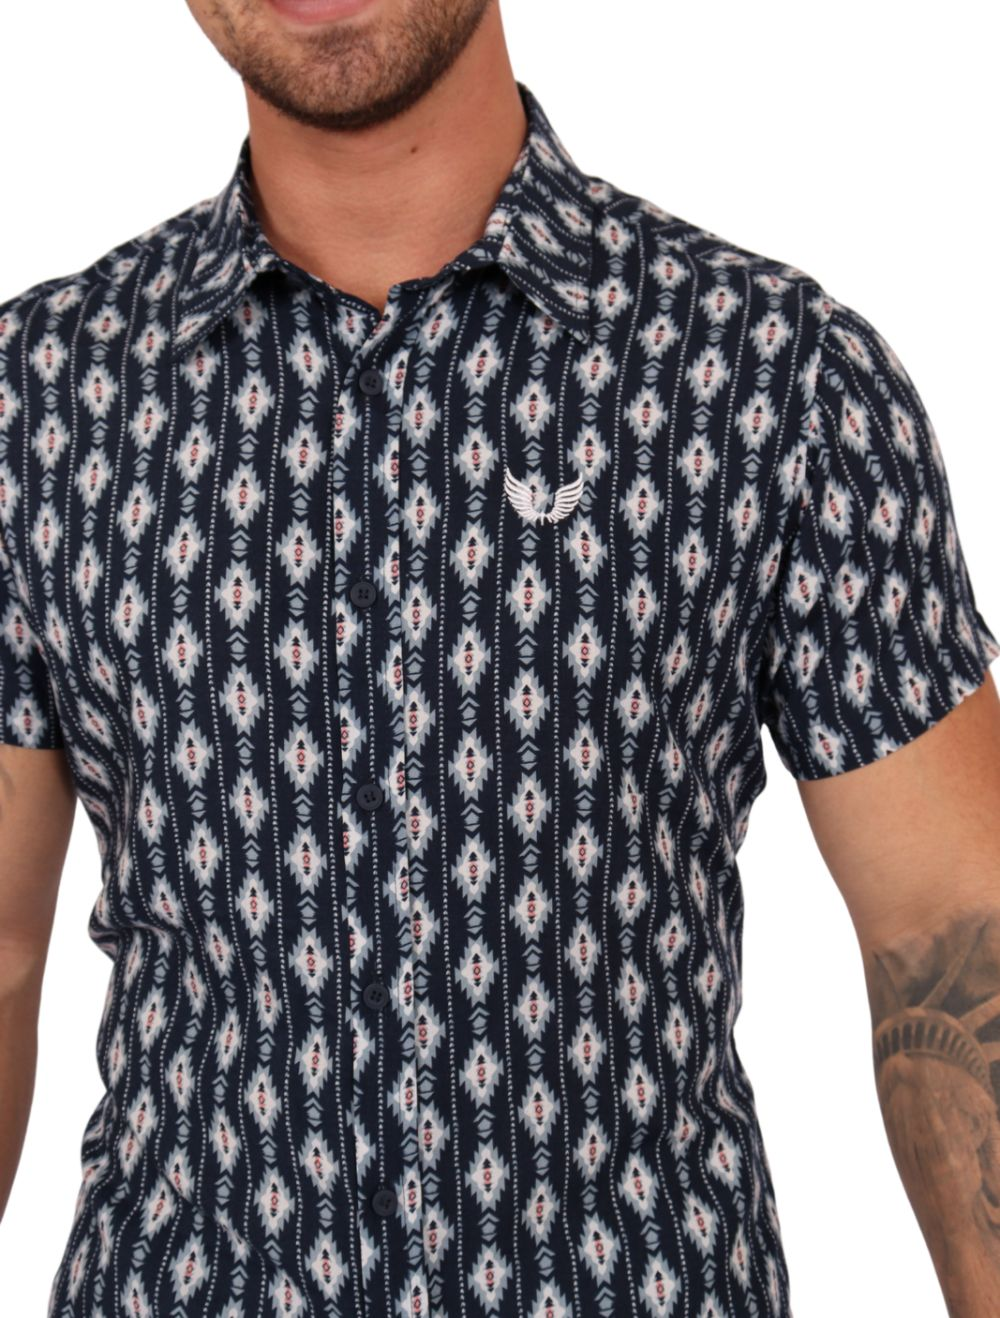 Camisa Masculina Manga Curta Estampada